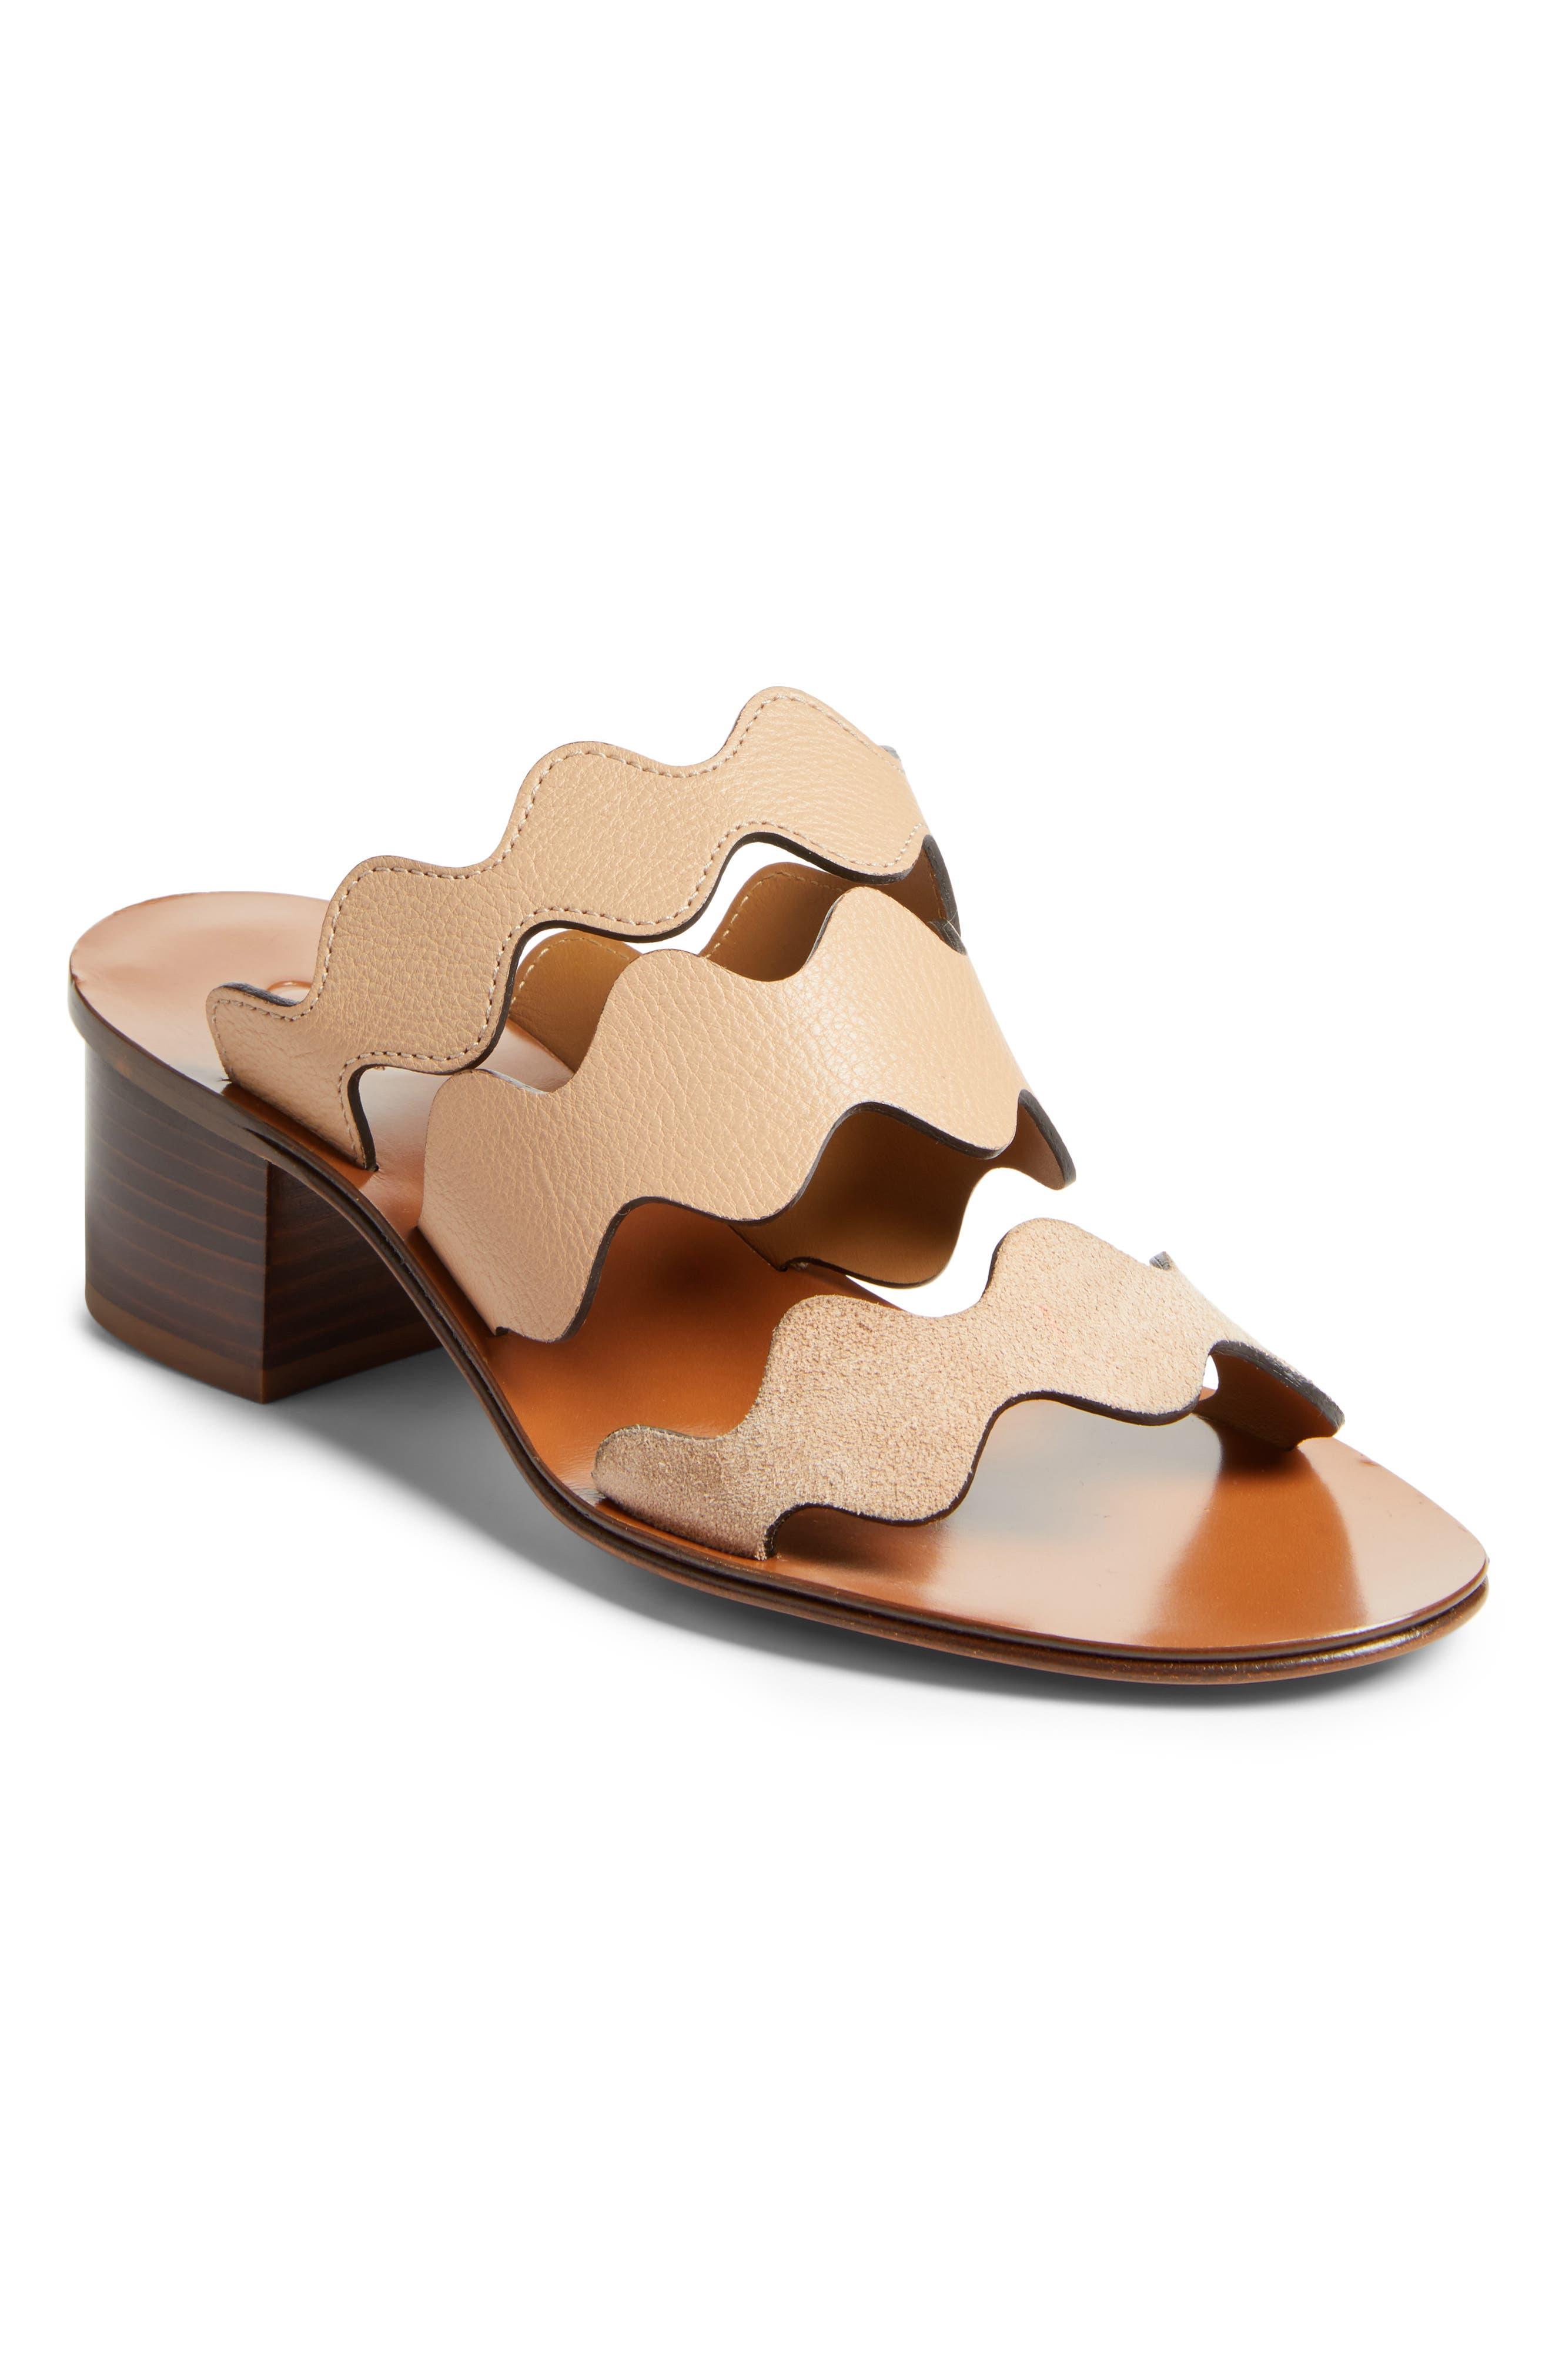 Lauren sandals - Pink & Purple Chlo�� As7NI2pld